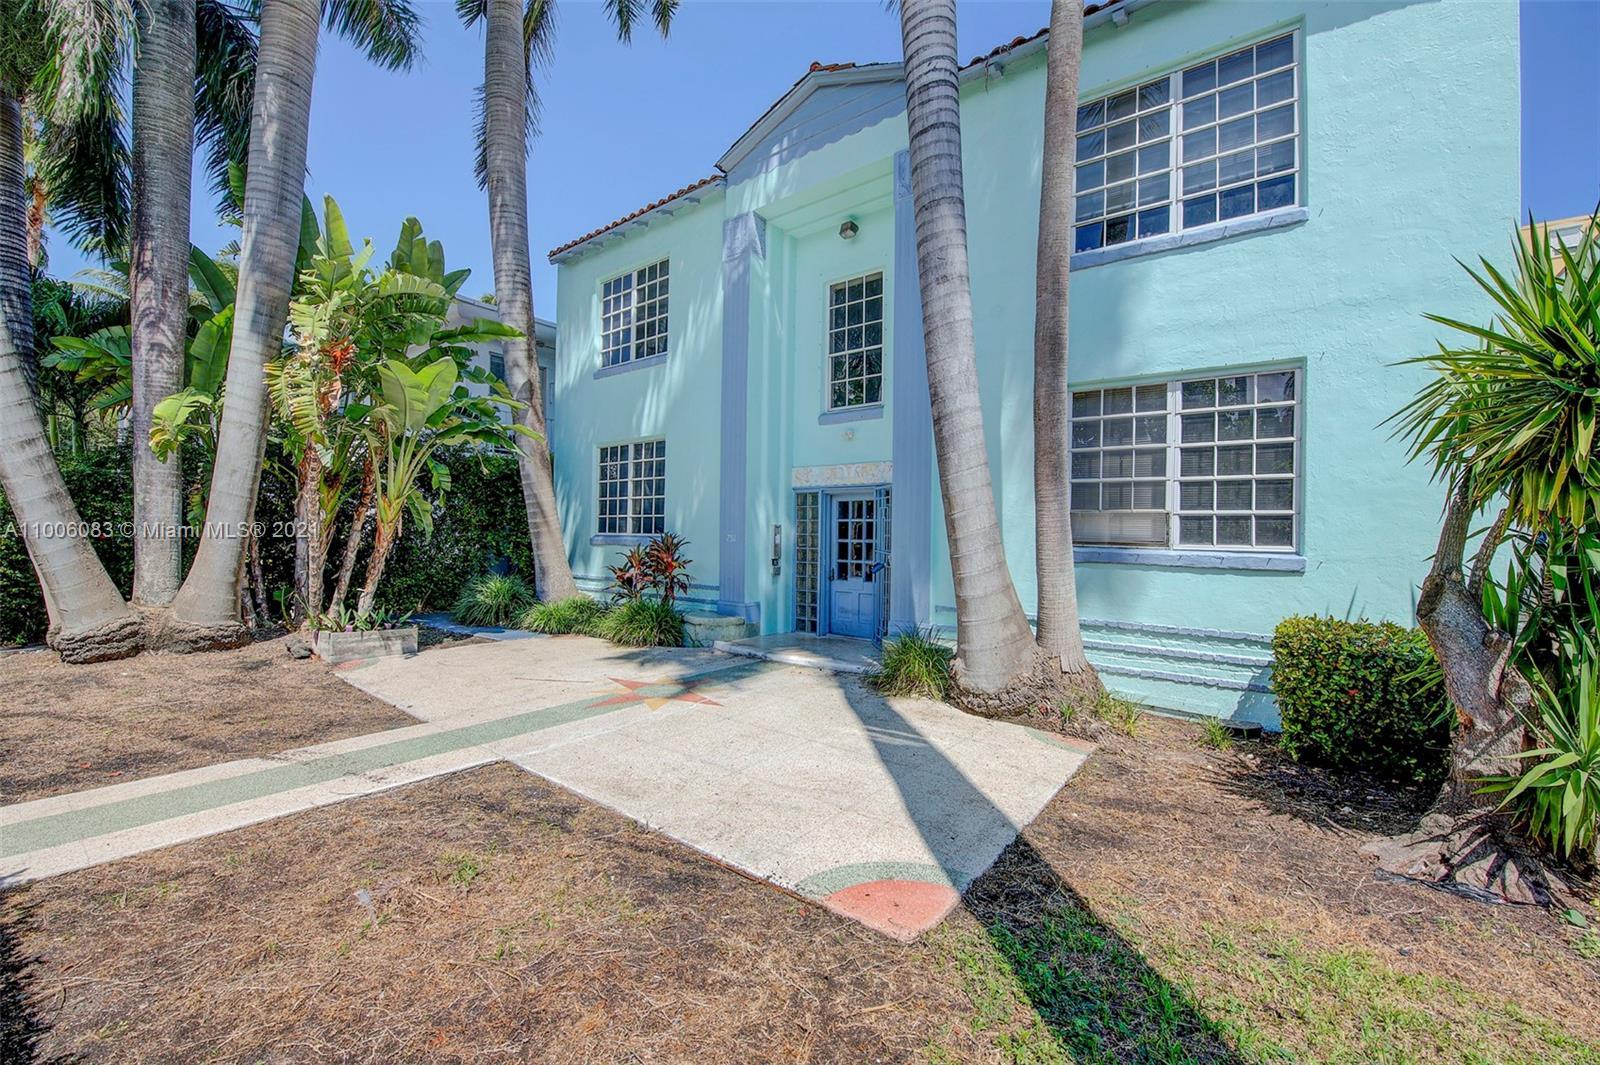 751 Euclid Ave, Miami Beach, Florida 33139